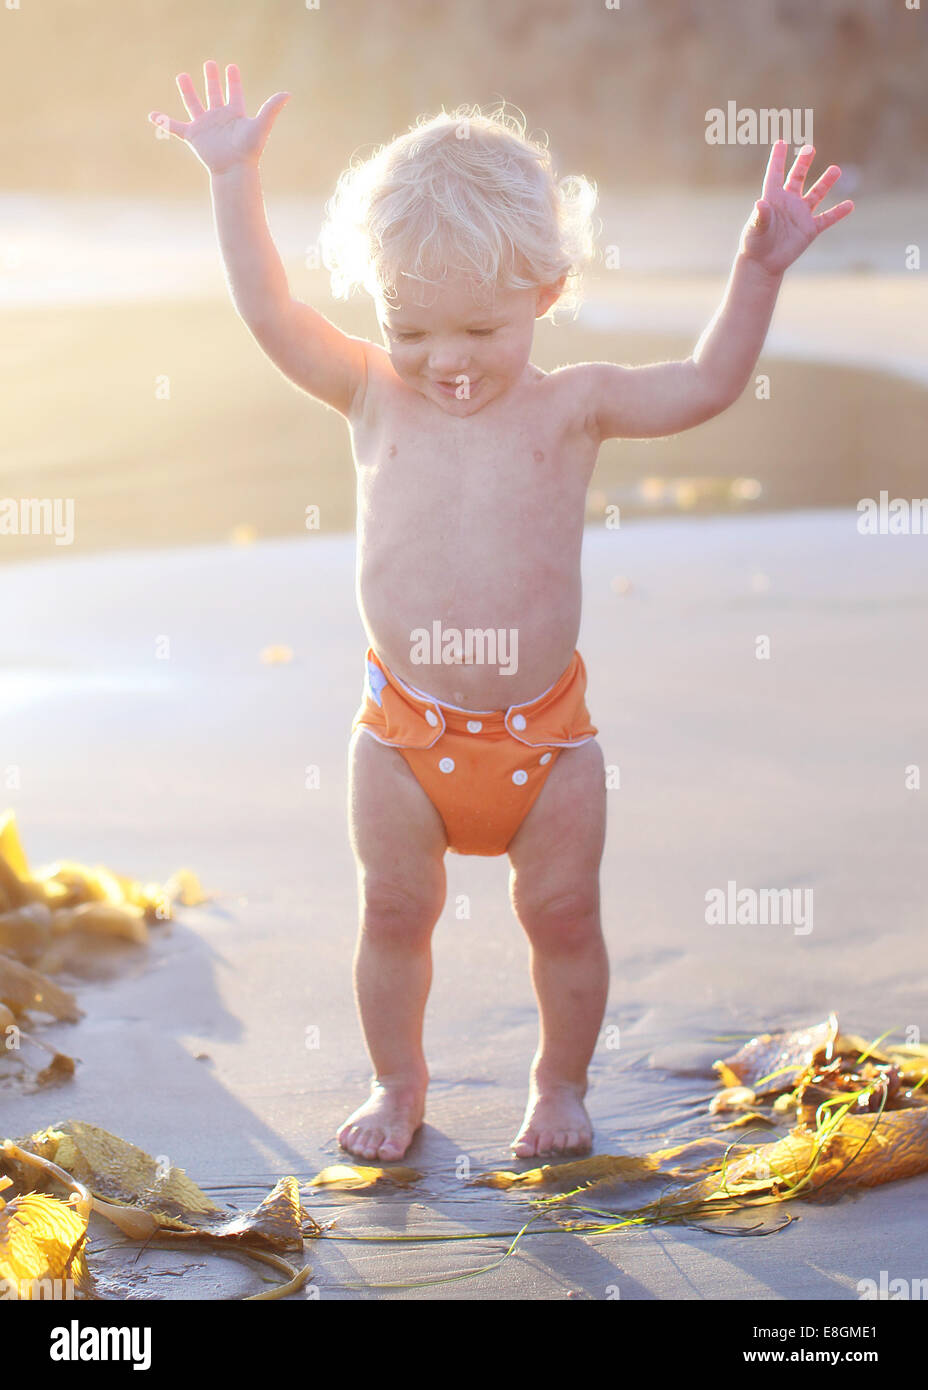 Toddler in diaper stockfotos toddler in diaper bilder for Schaukelstuhl kleinkind